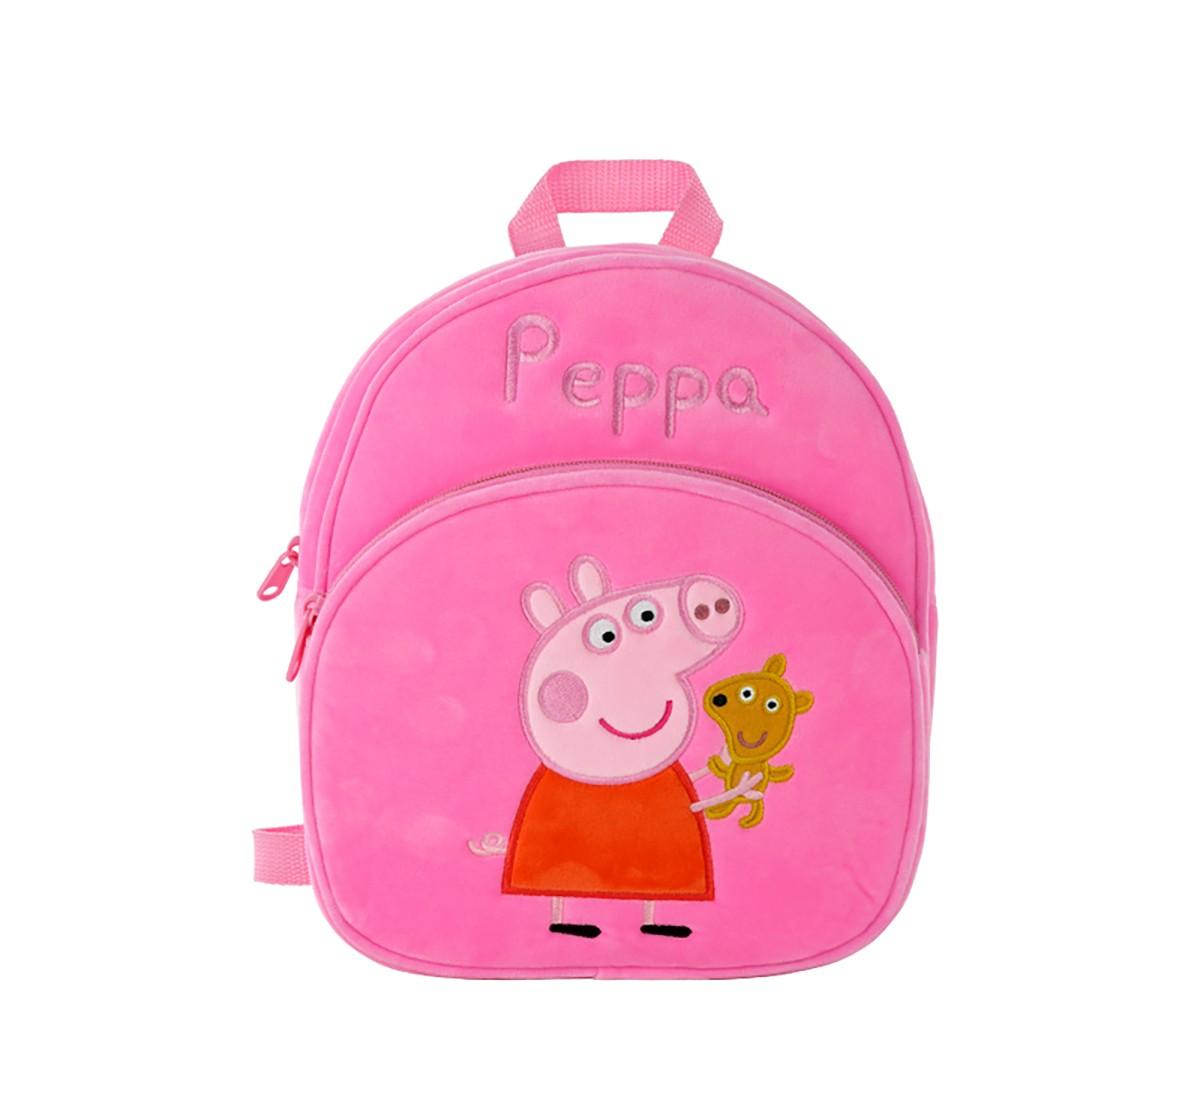 Peppa Pig Bag Plush Accessory for Girls age 1Y+ - 28 Cm (Pink)